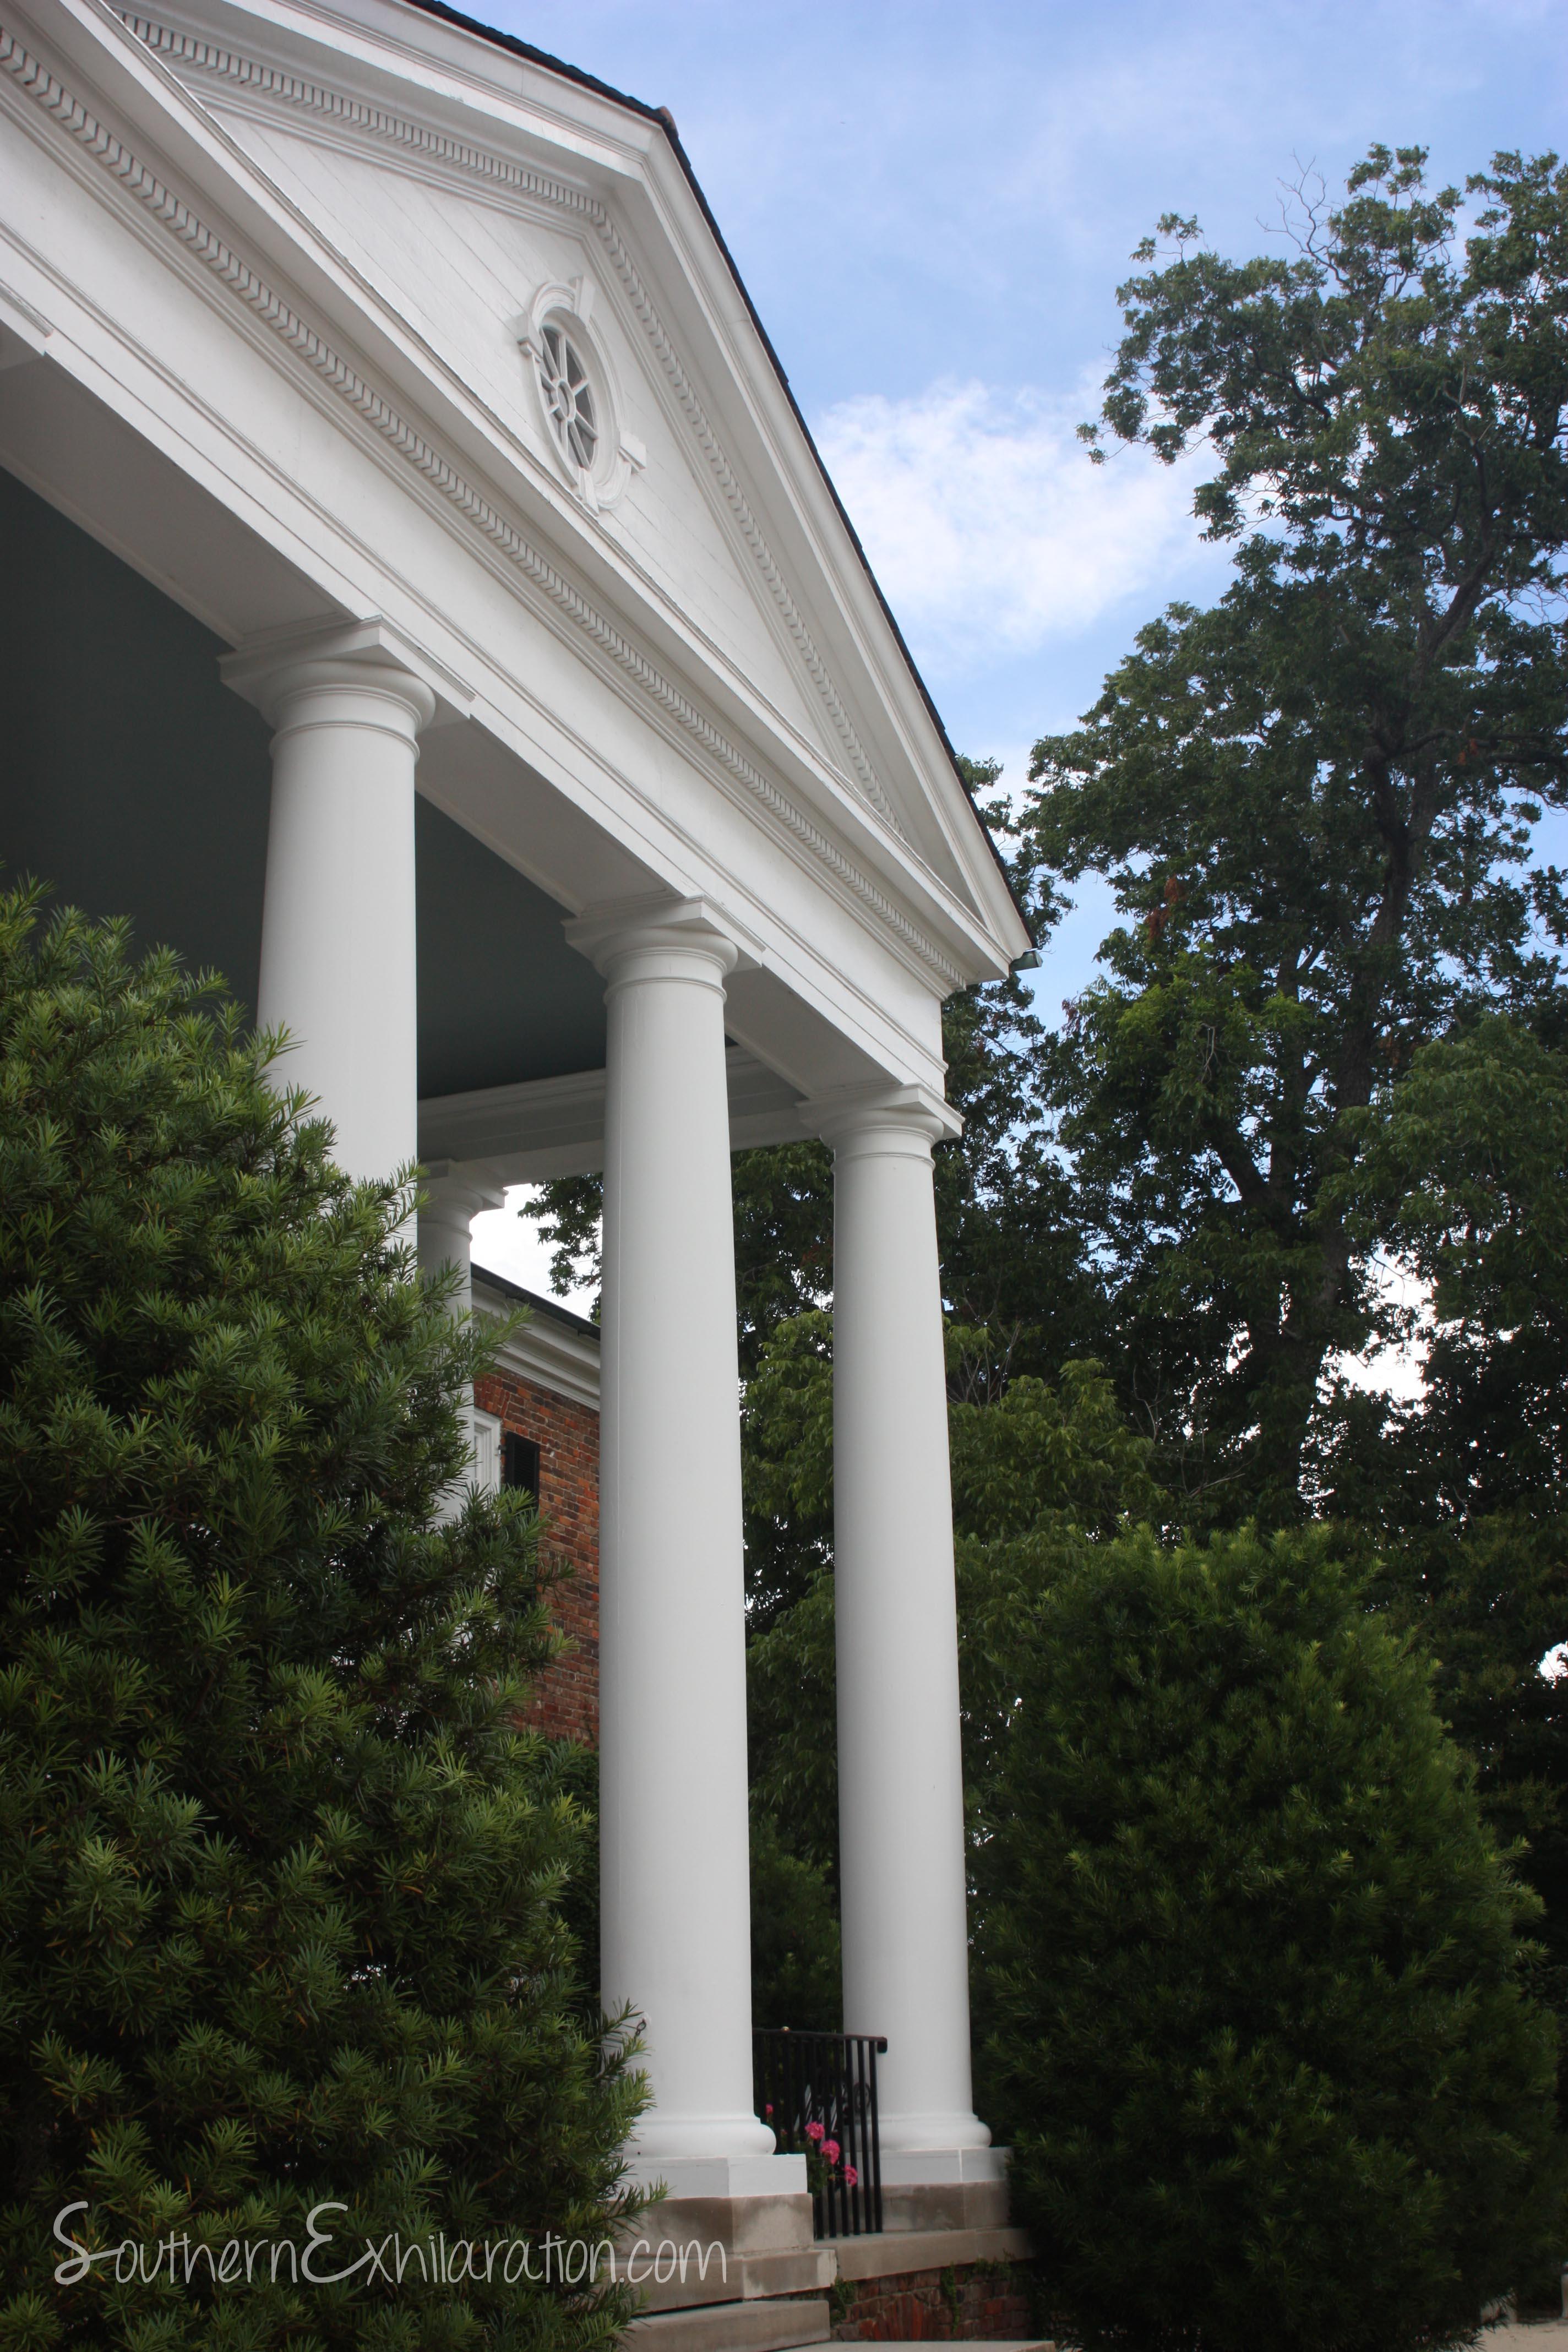 Boone Hall Plantation 2013: Southern Exhilaration